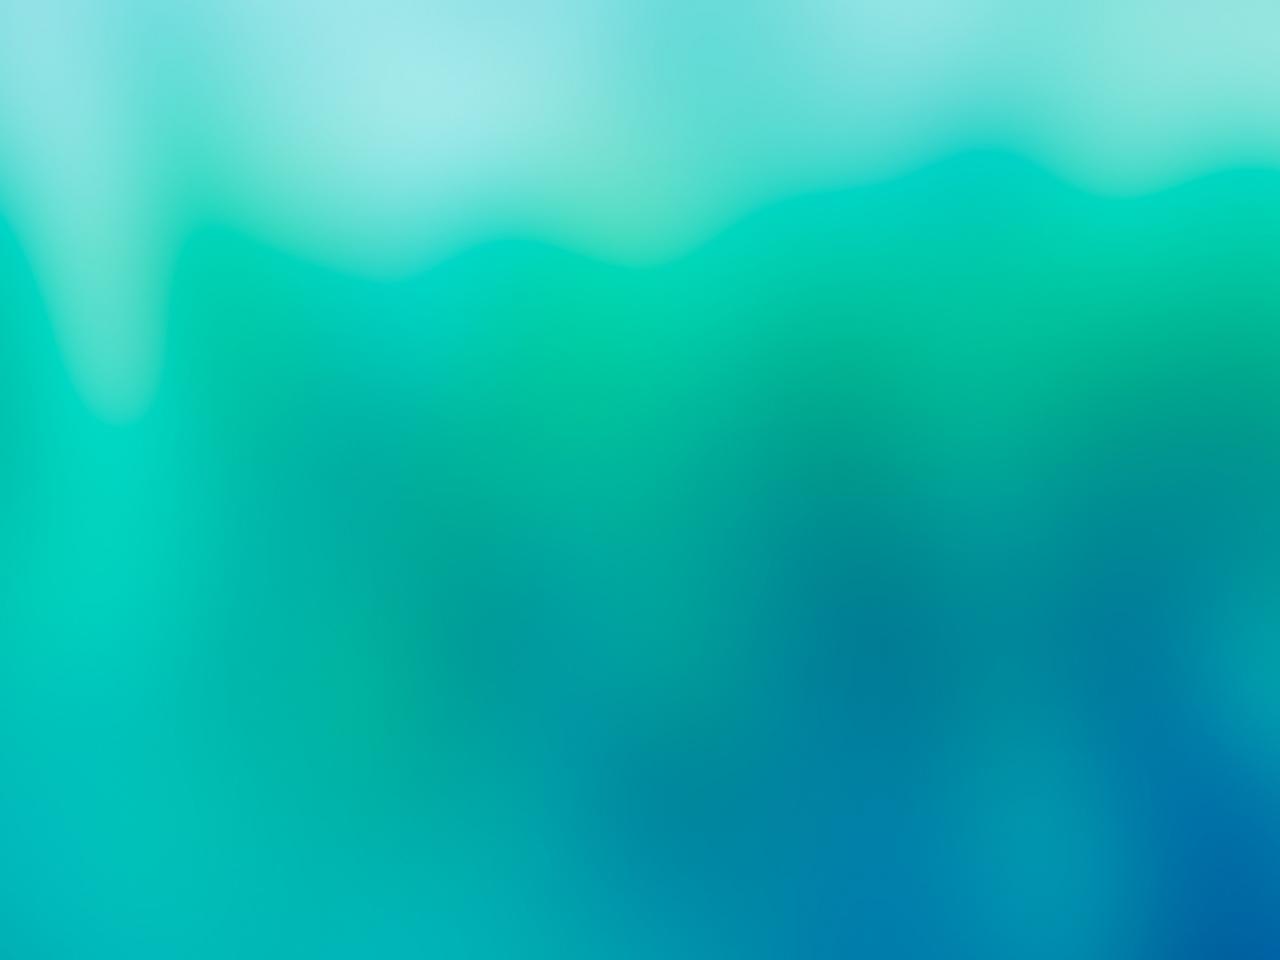 Fondo azul verdoso hd 1280x960 - imagenes - wallpapers